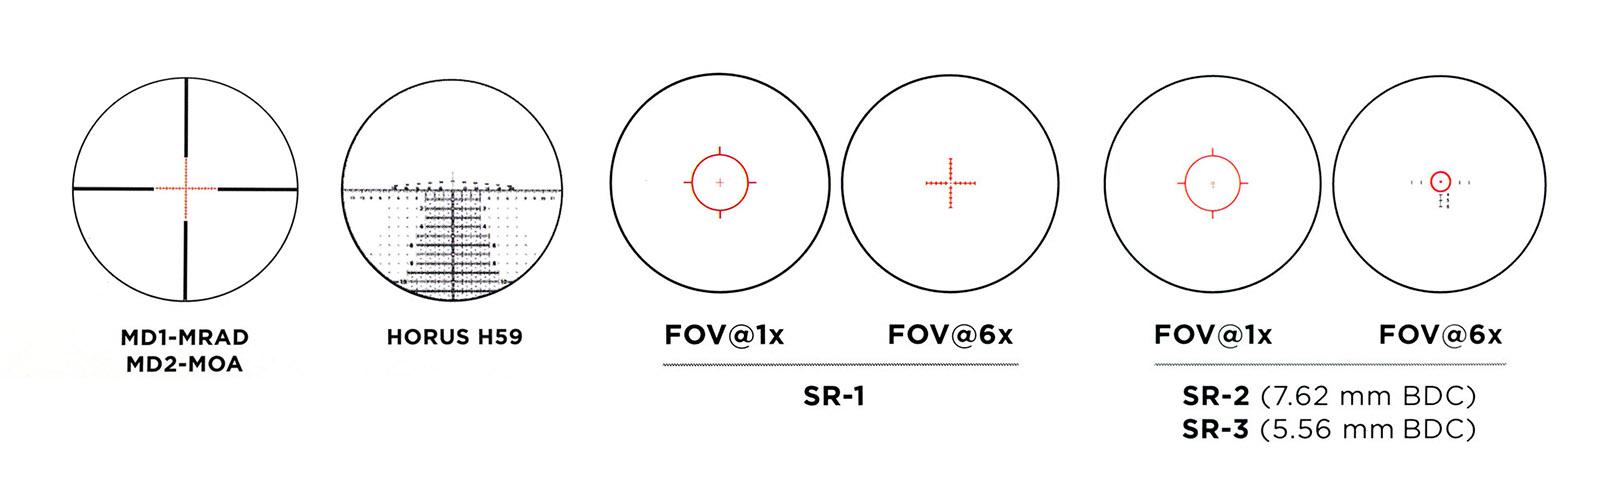 Image result for Vudu rifle scopes